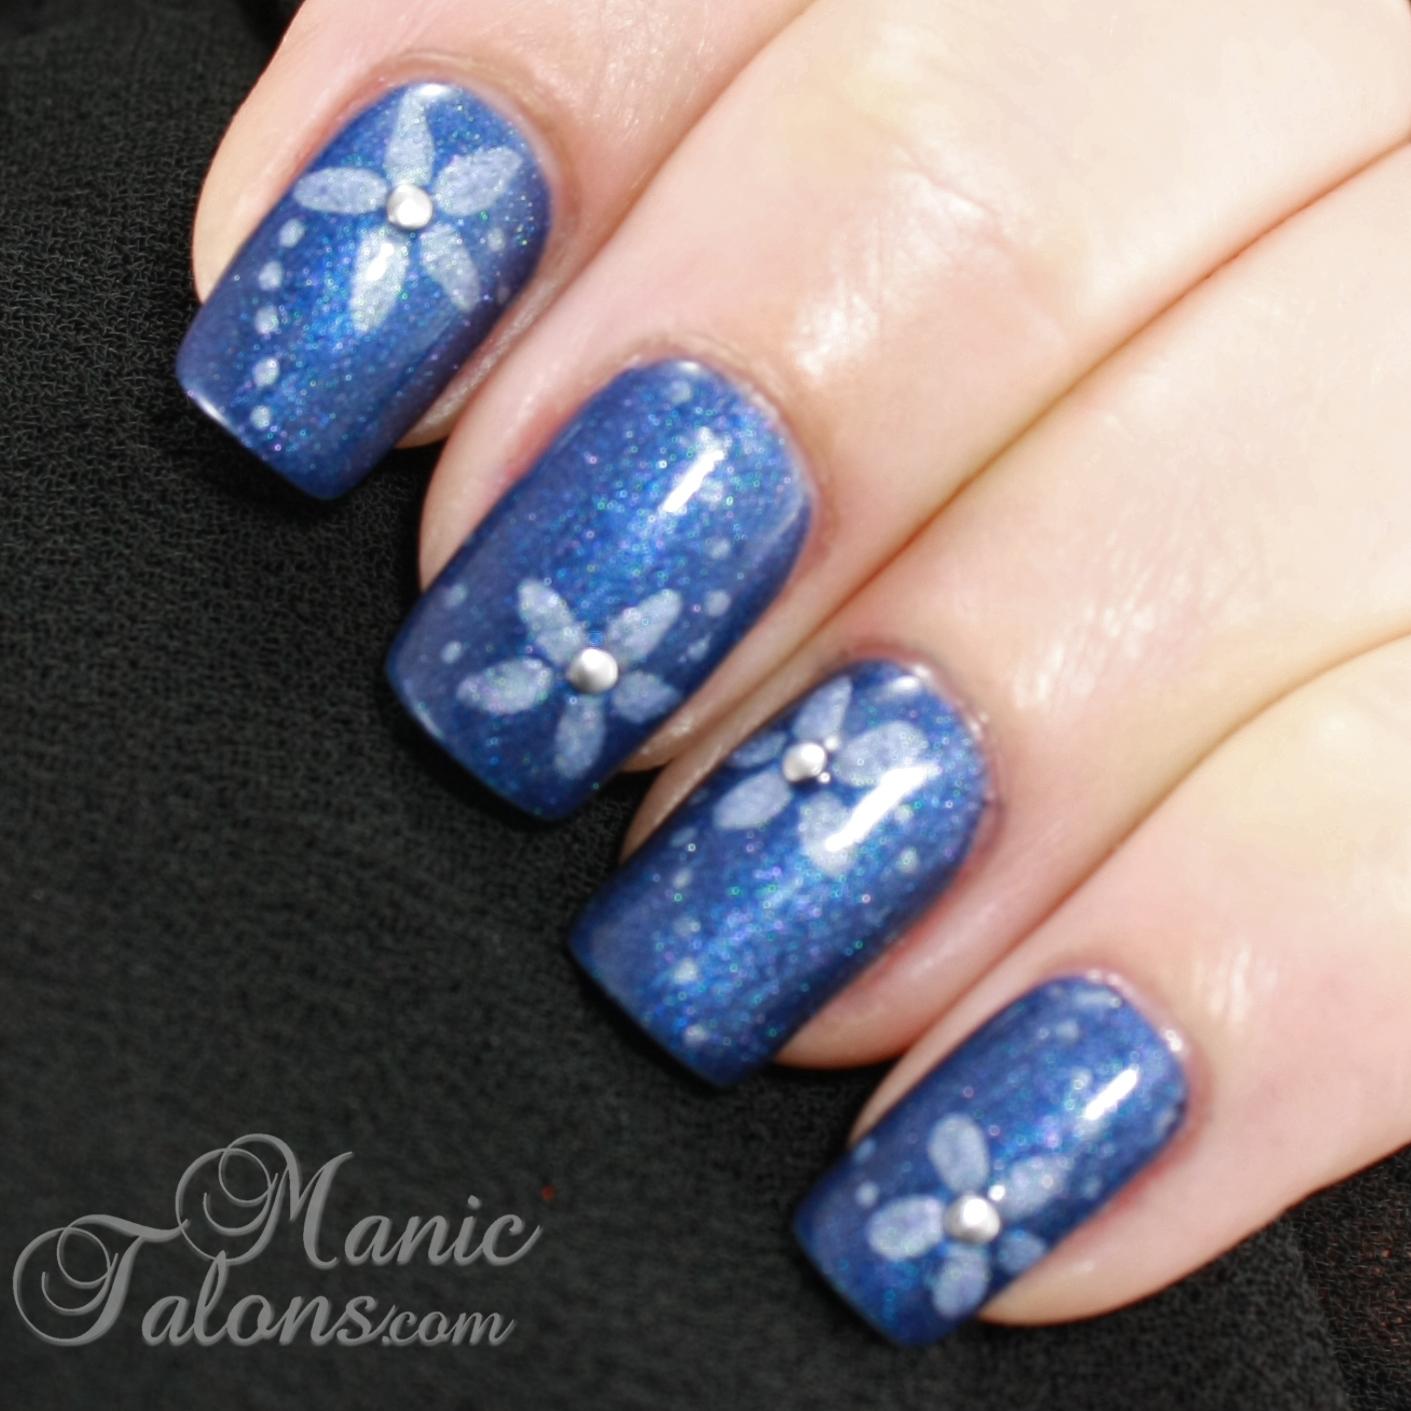 Manic Talons Nail Design: Simple Blue Flowers